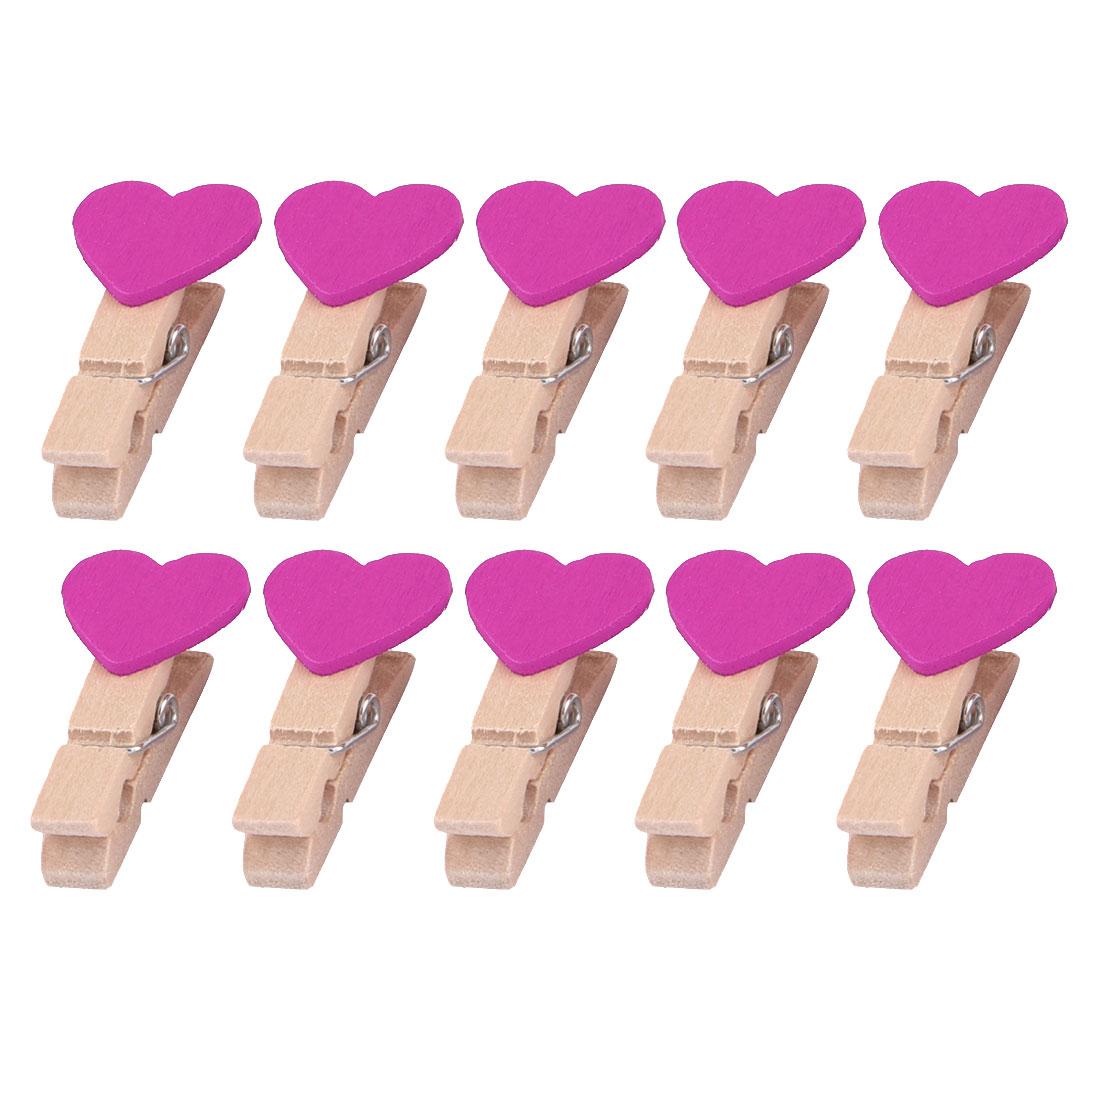 Family Wooden Heart Shape DIY Crafts Card Photo Ornament Peg Clip Fuchsia 10pcs